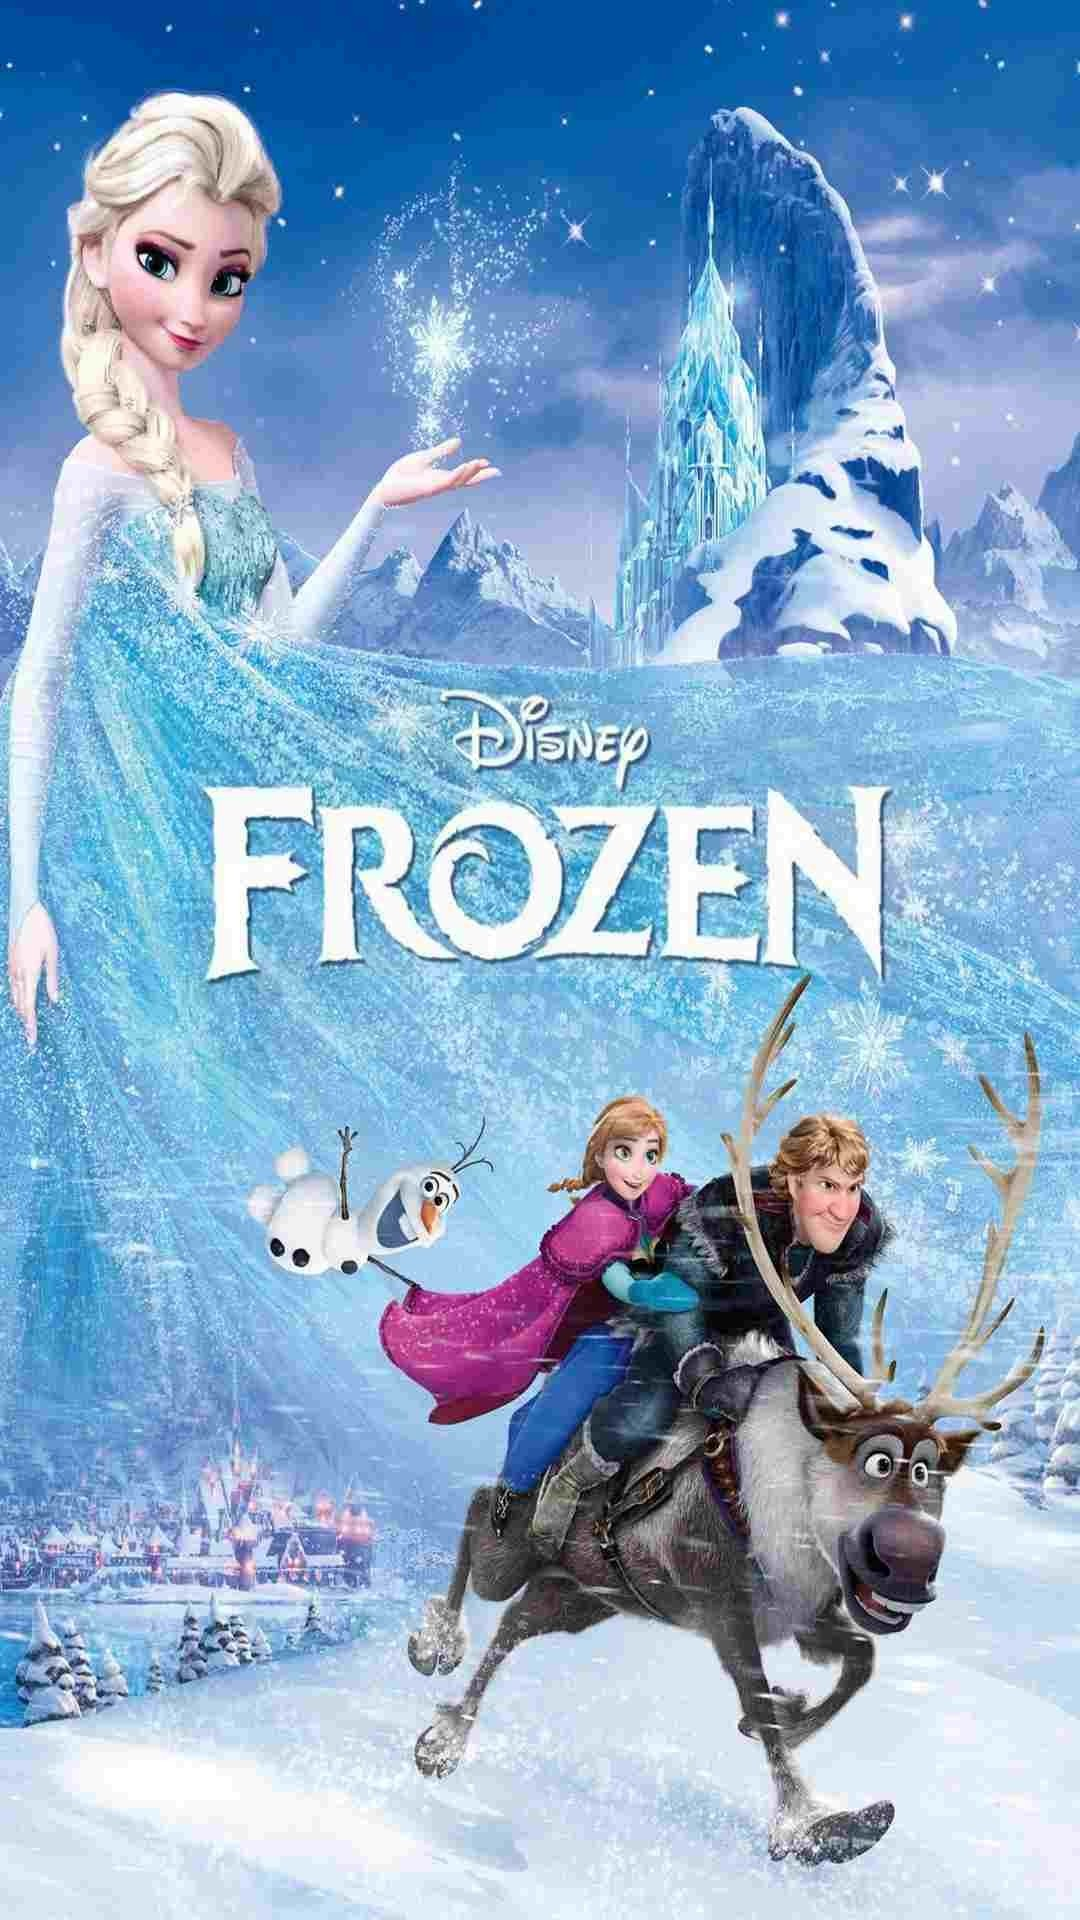 Elsa frozen wallpaper phone 71 images - Wallpaper for frozen ...